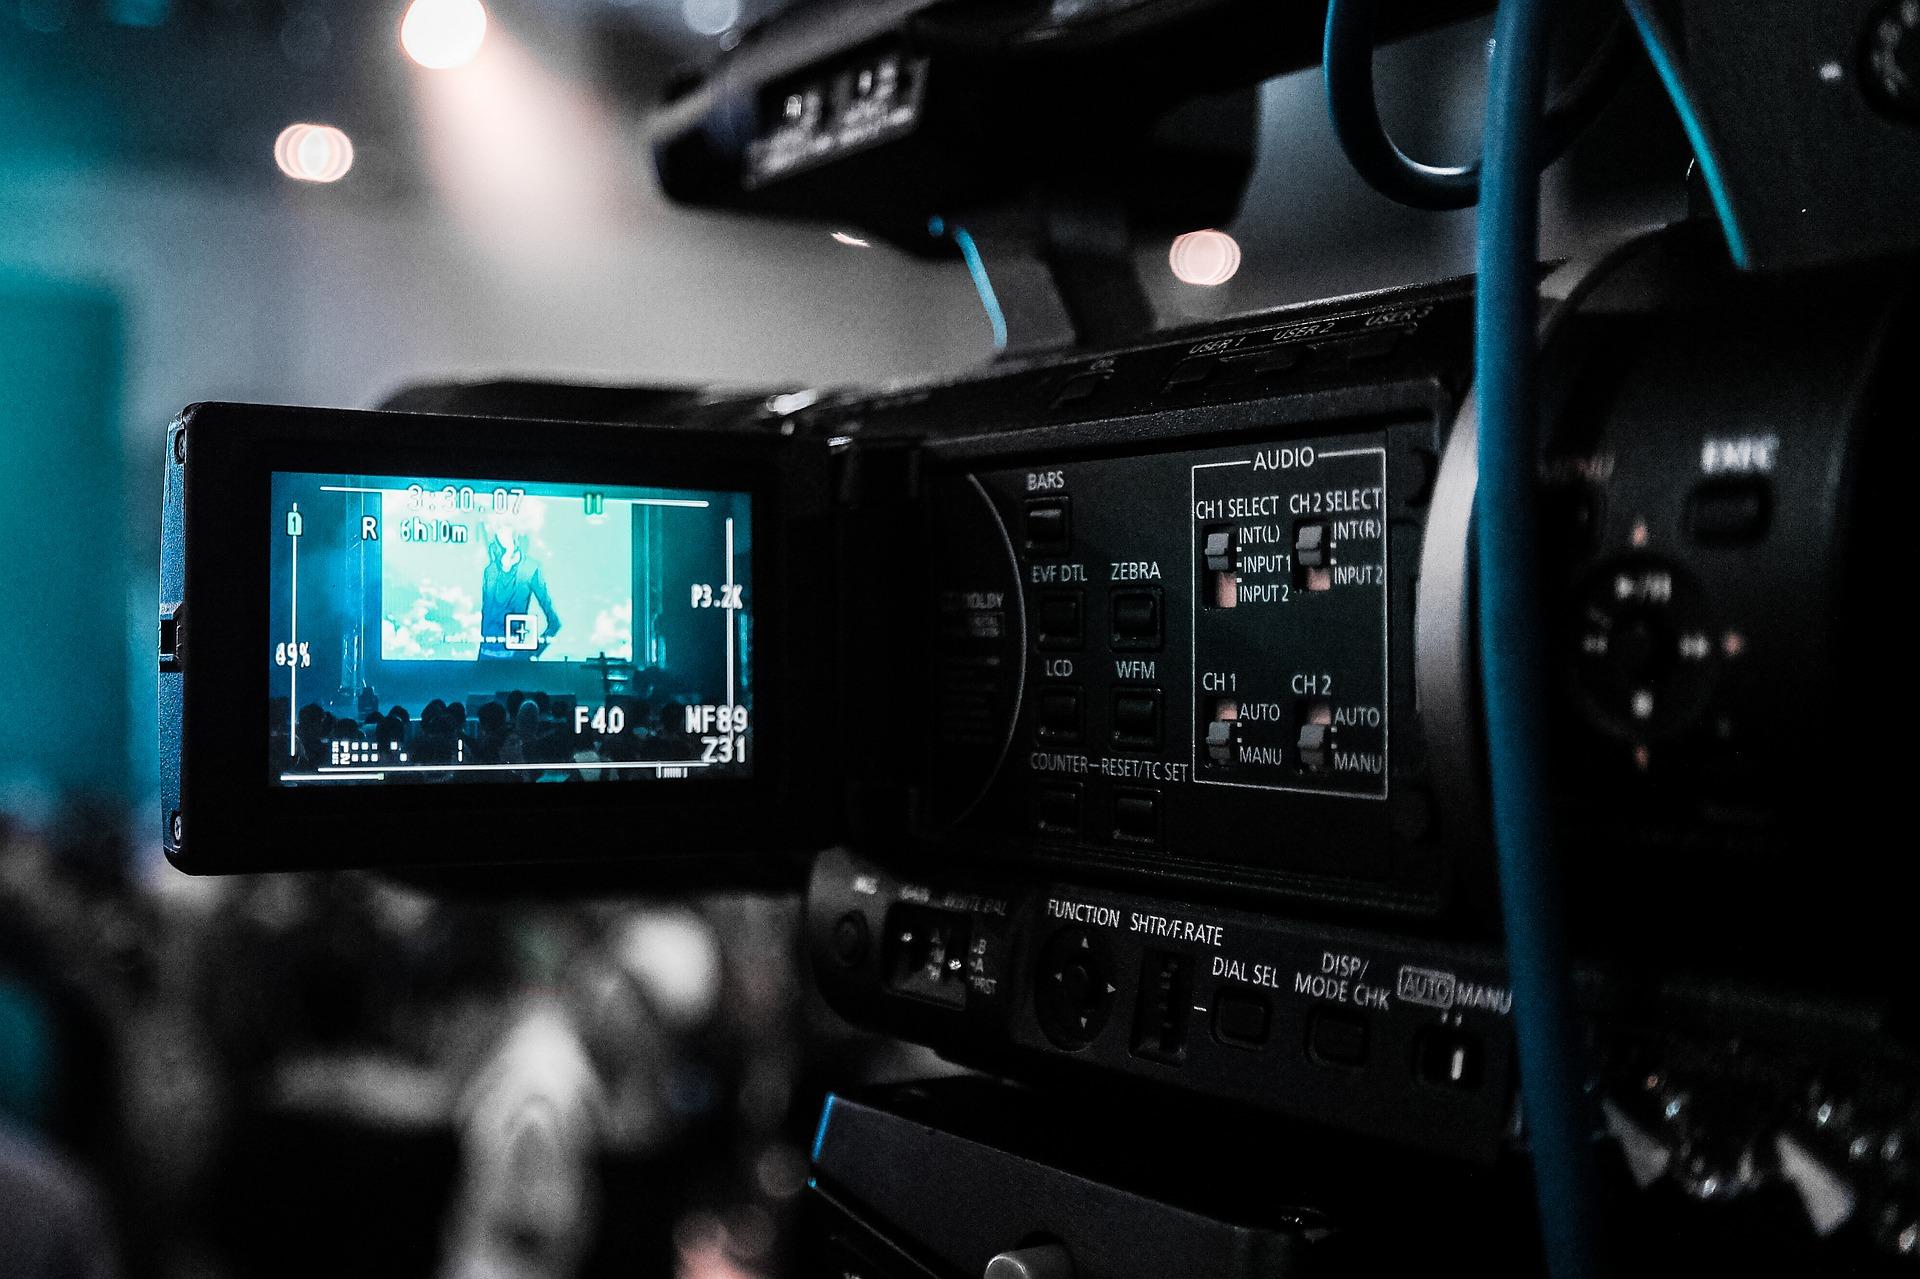 VIDEO & DIGITAL FILM